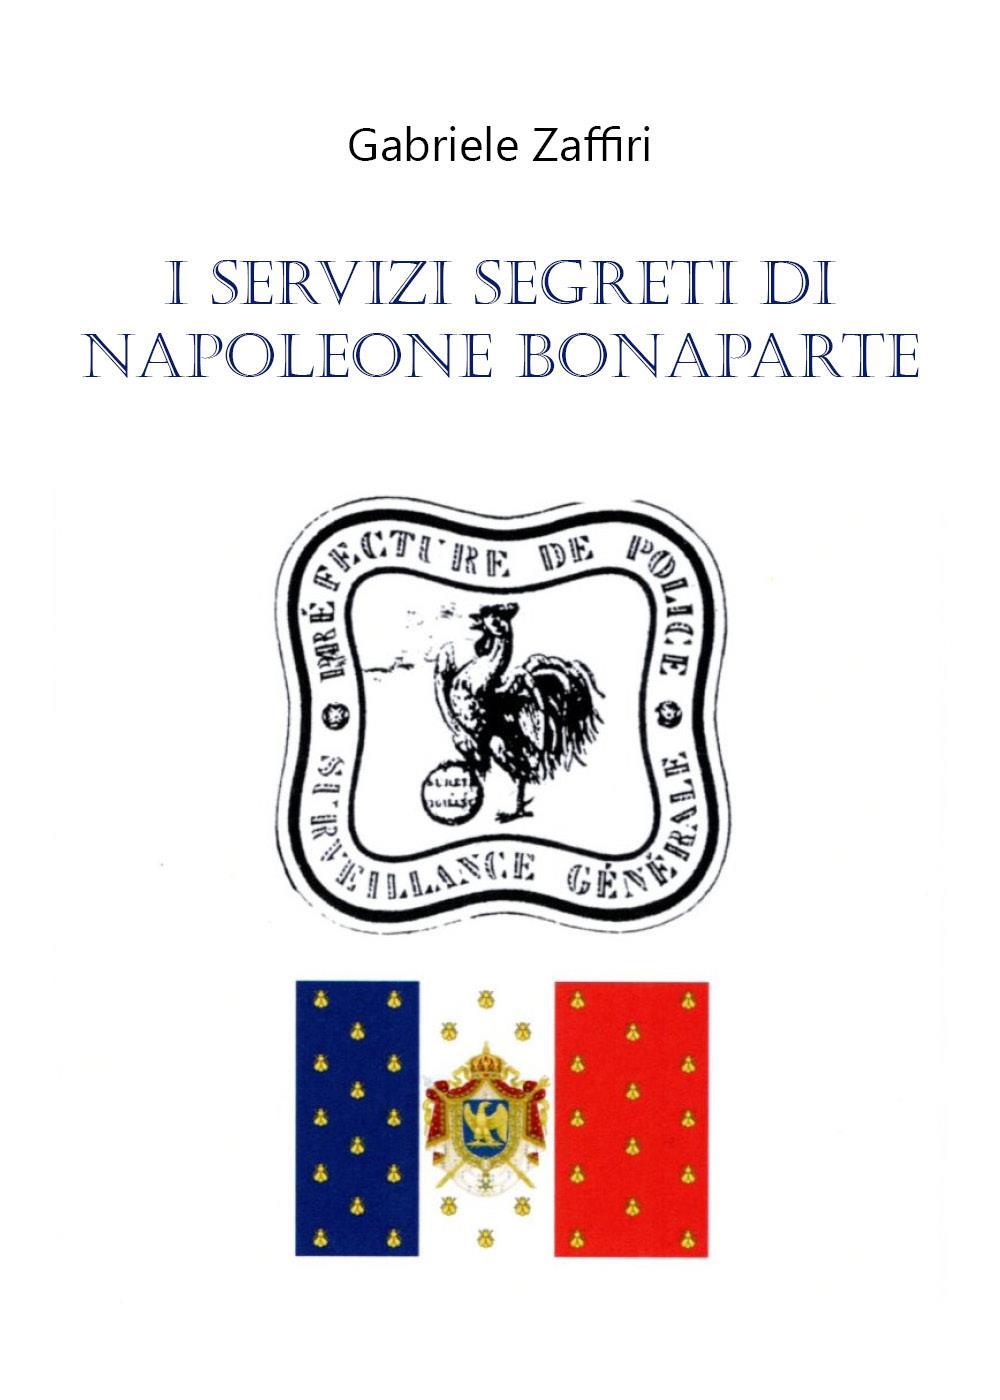 I Servizi Segreti di Napoleone Bonaparte